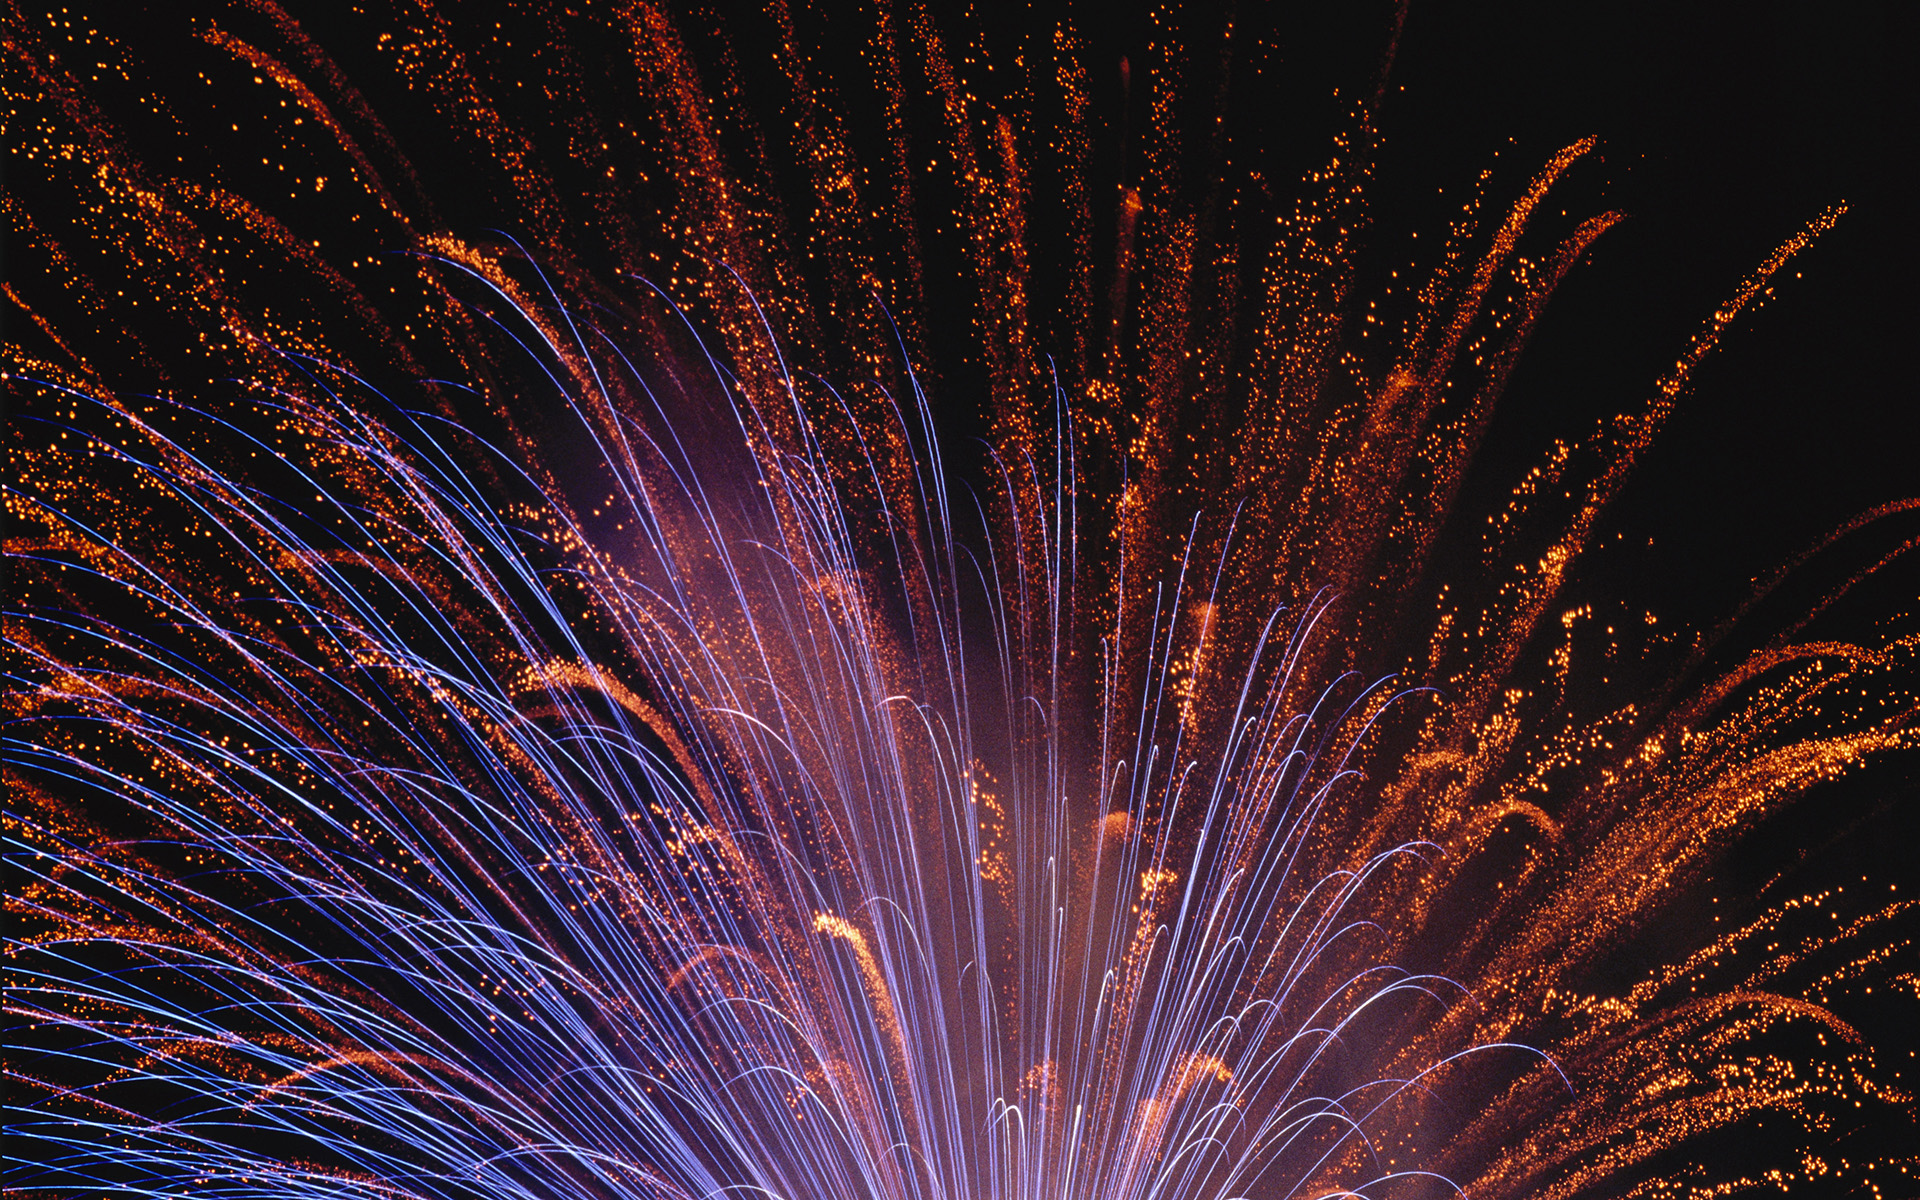 http://4.bp.blogspot.com/_W1ueYt1O3xs/TT7RZHkC8UI/AAAAAAAAXqc/Kn0zNzA4k8s/d/fireworks%20wallpapers%20-%20win%207%20%286%29.jpg